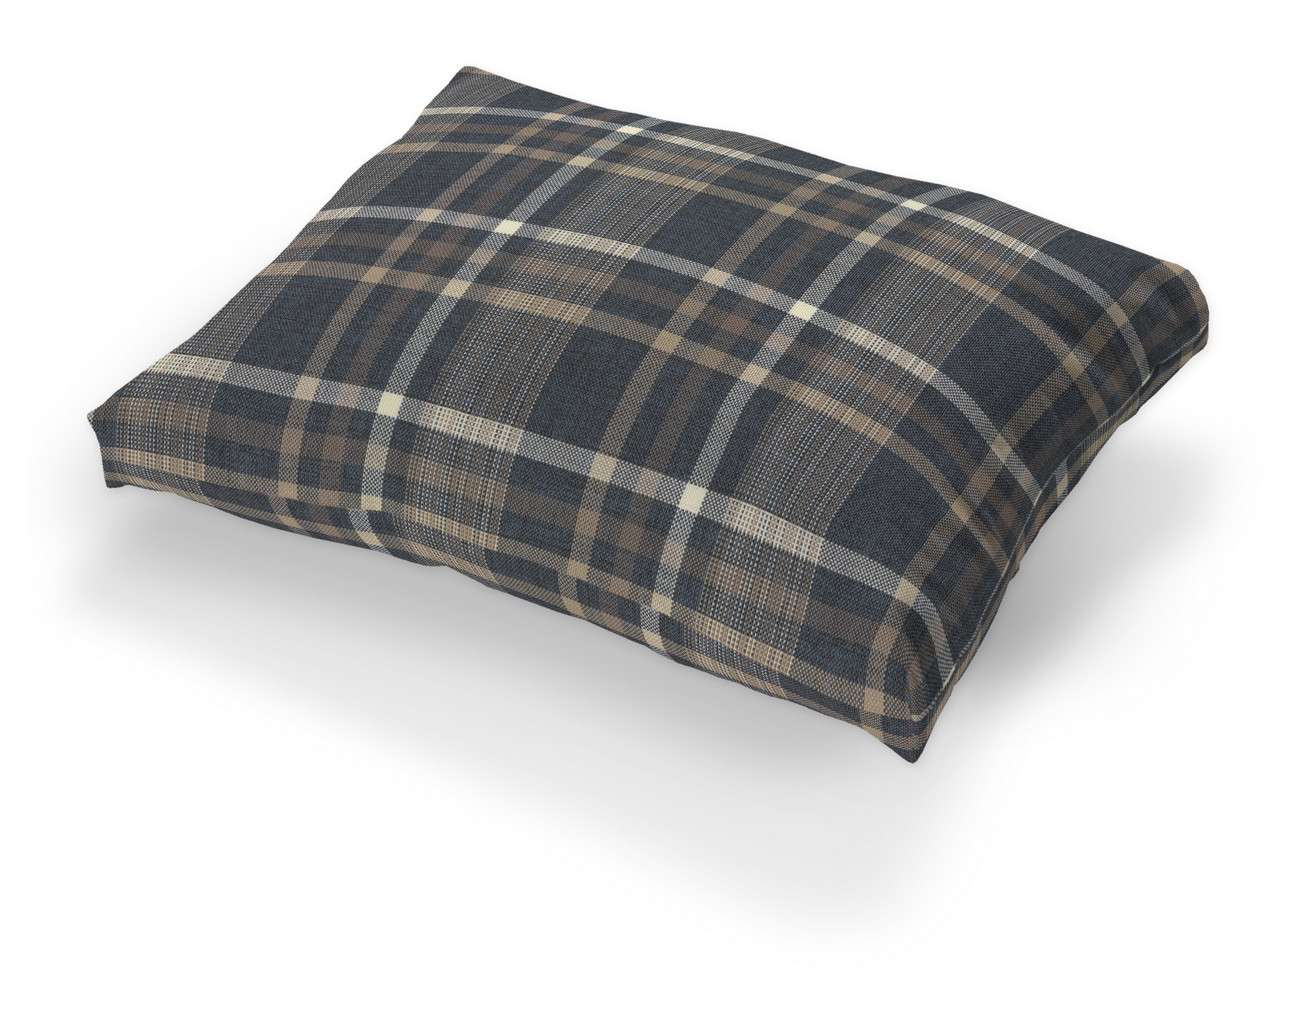 Poszewka na poduszkę Tylösand 1 szt. w kolekcji Edinburgh, tkanina: 703-16